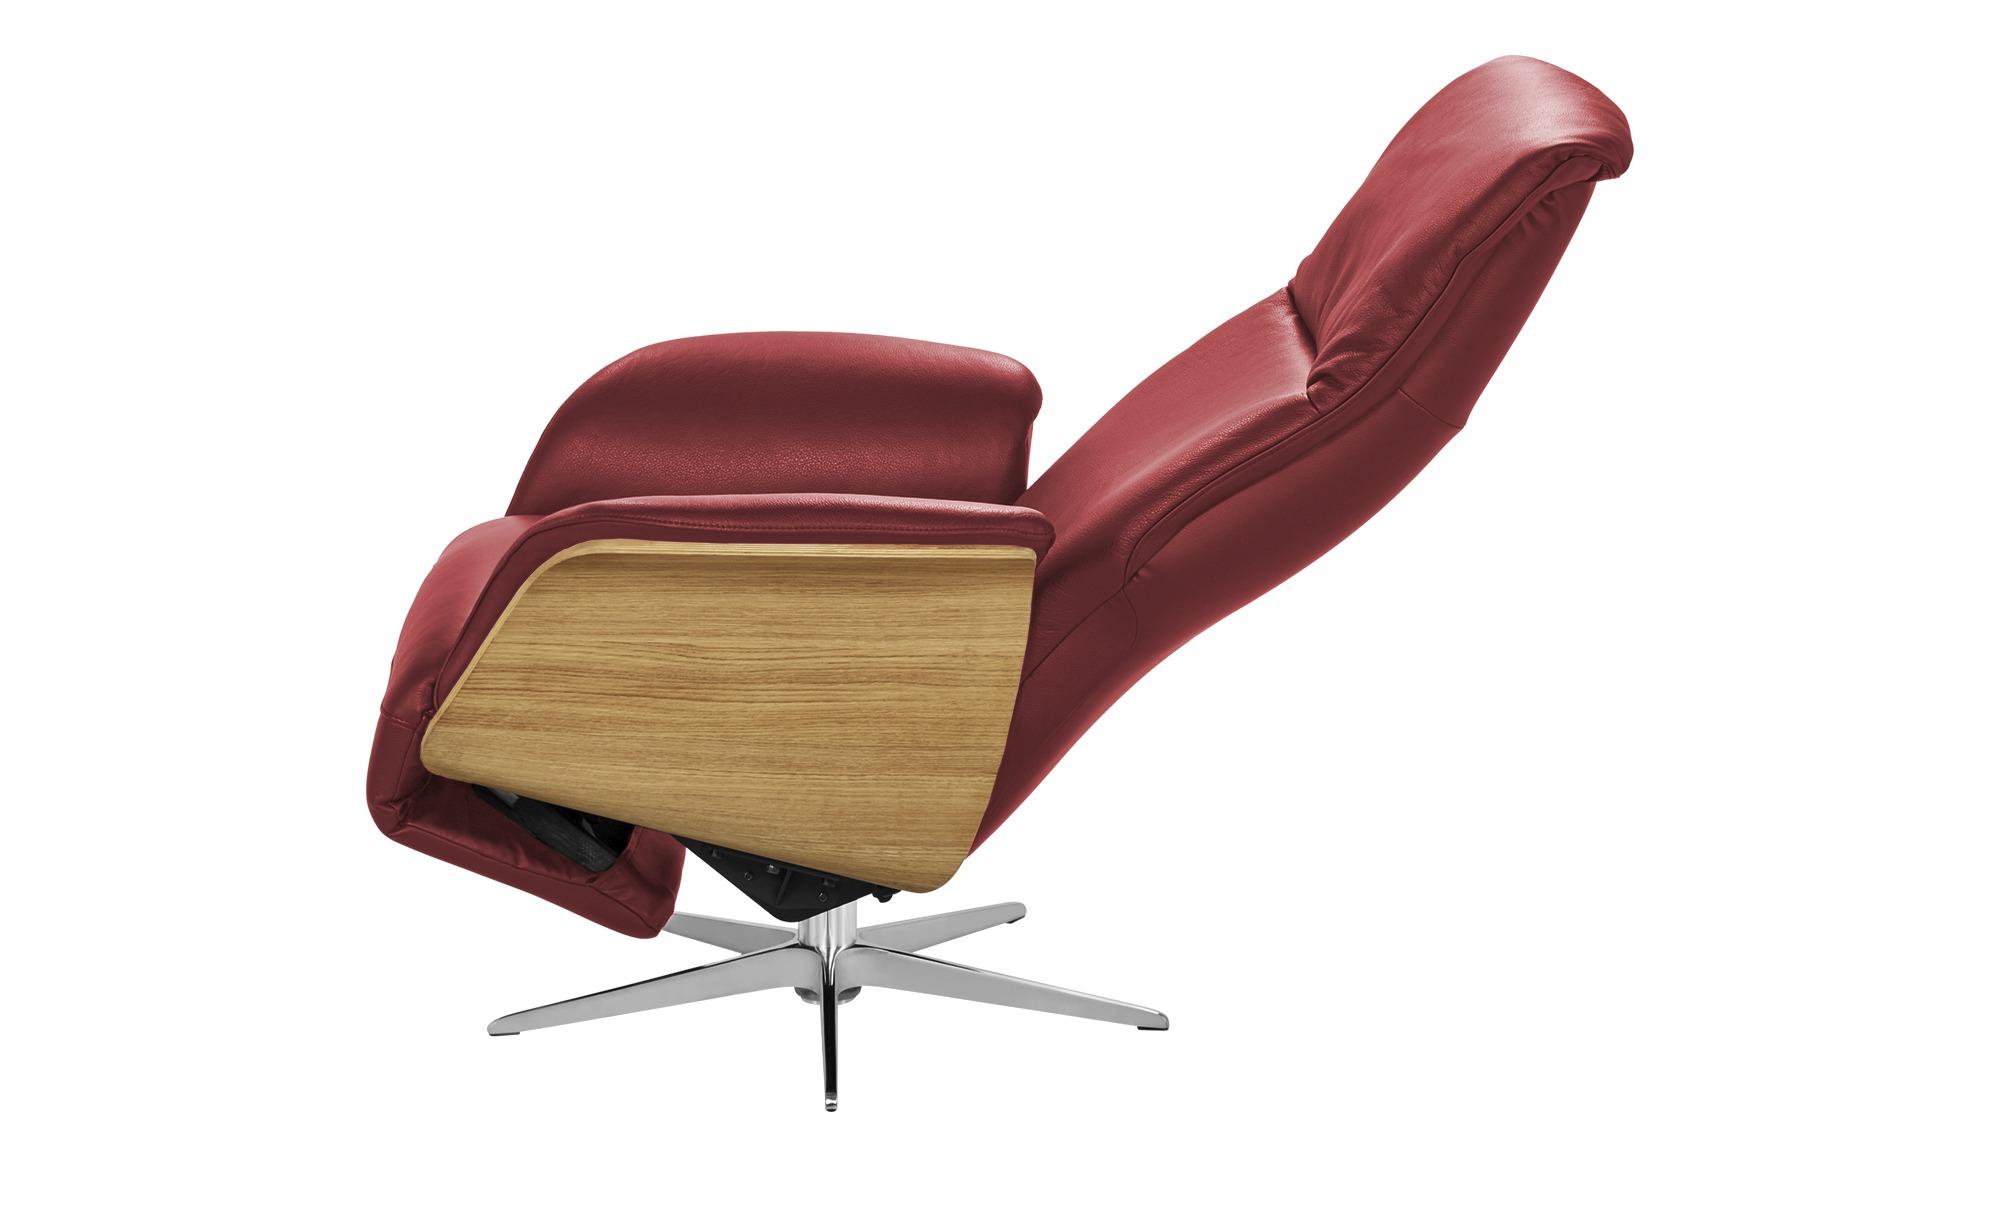 Nils Olsen Relaxsessel  Frederik ¦ rot ¦ Maße (cm): B: 78 H: 113 T: 79 Polstermöbel > Sessel > Fernsehsessel - Höffner